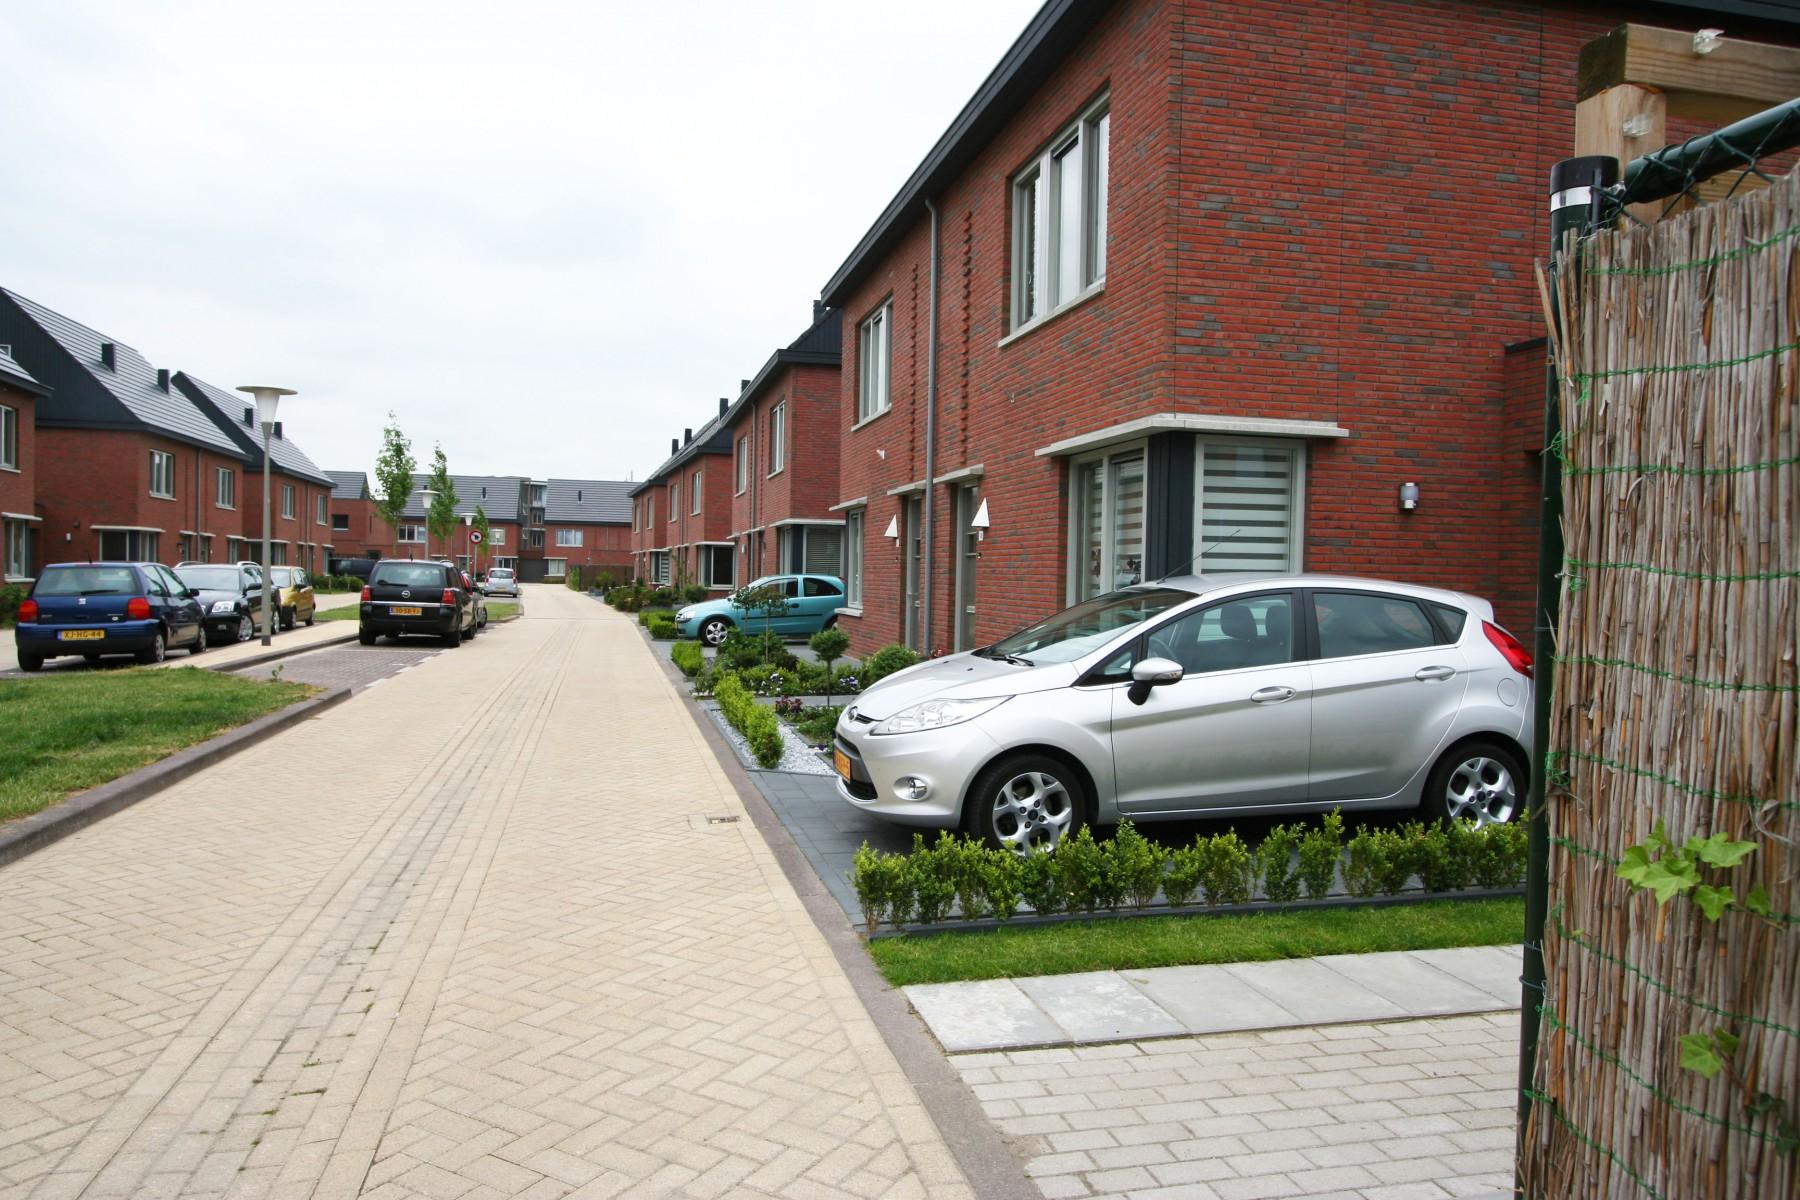 Arnhem, Schuytgraaf twee-onder-één-kapwoningen